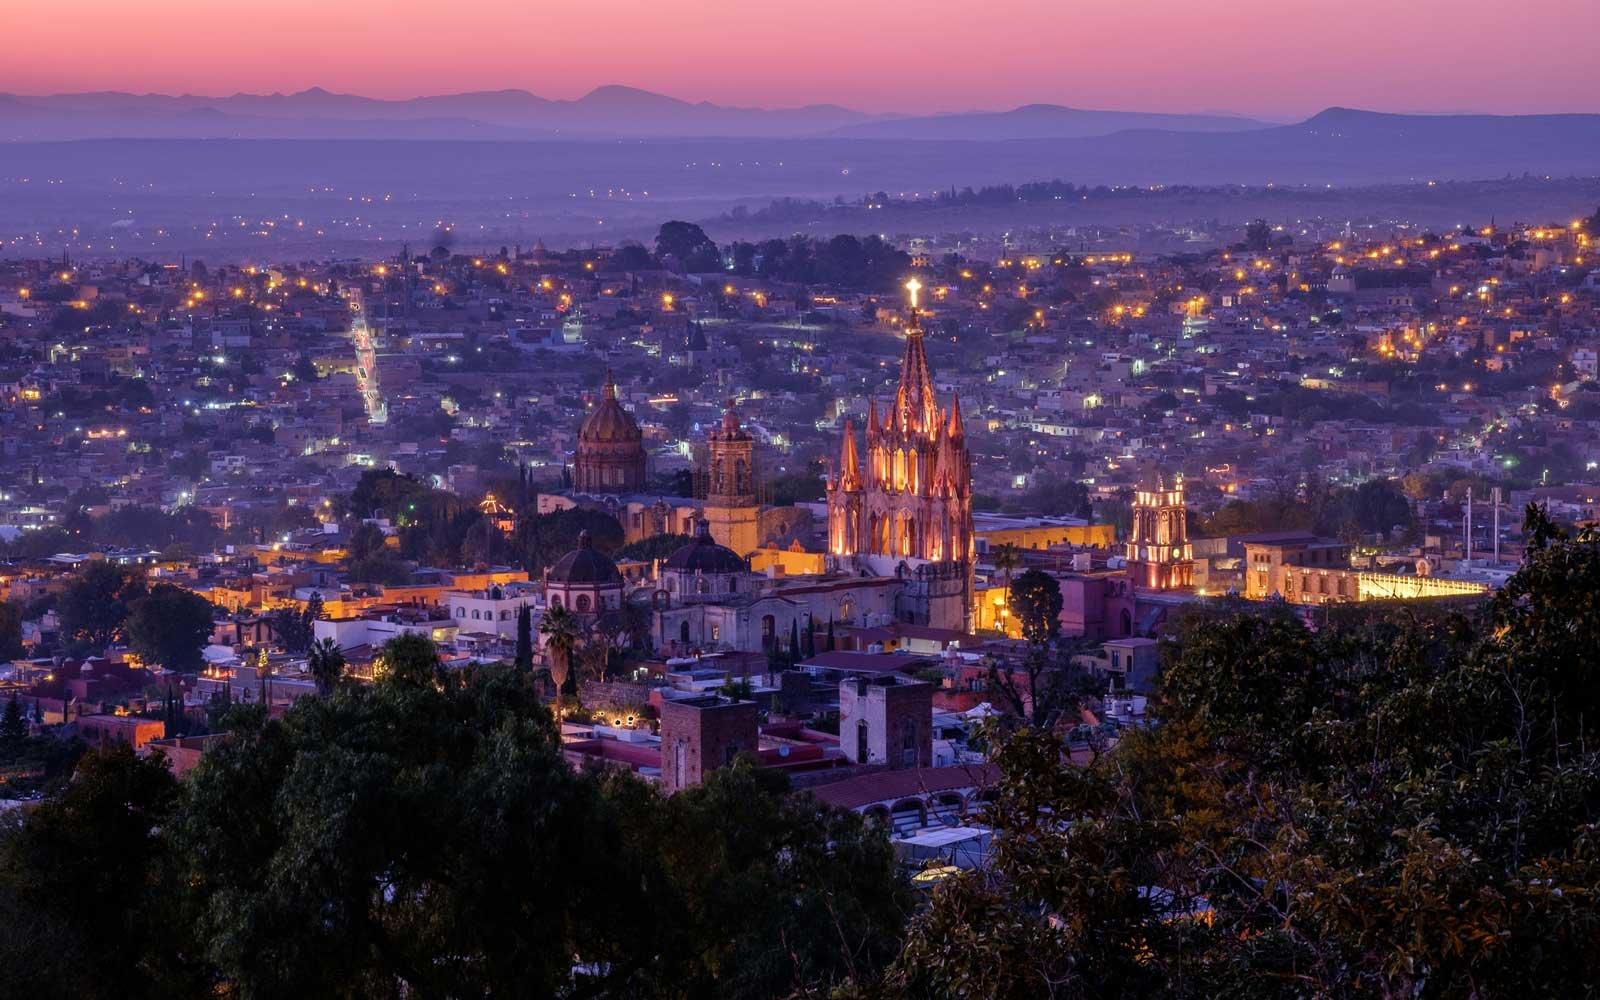 night-city-view-san-miguel-de-allende-ALLENDE0717.jpg